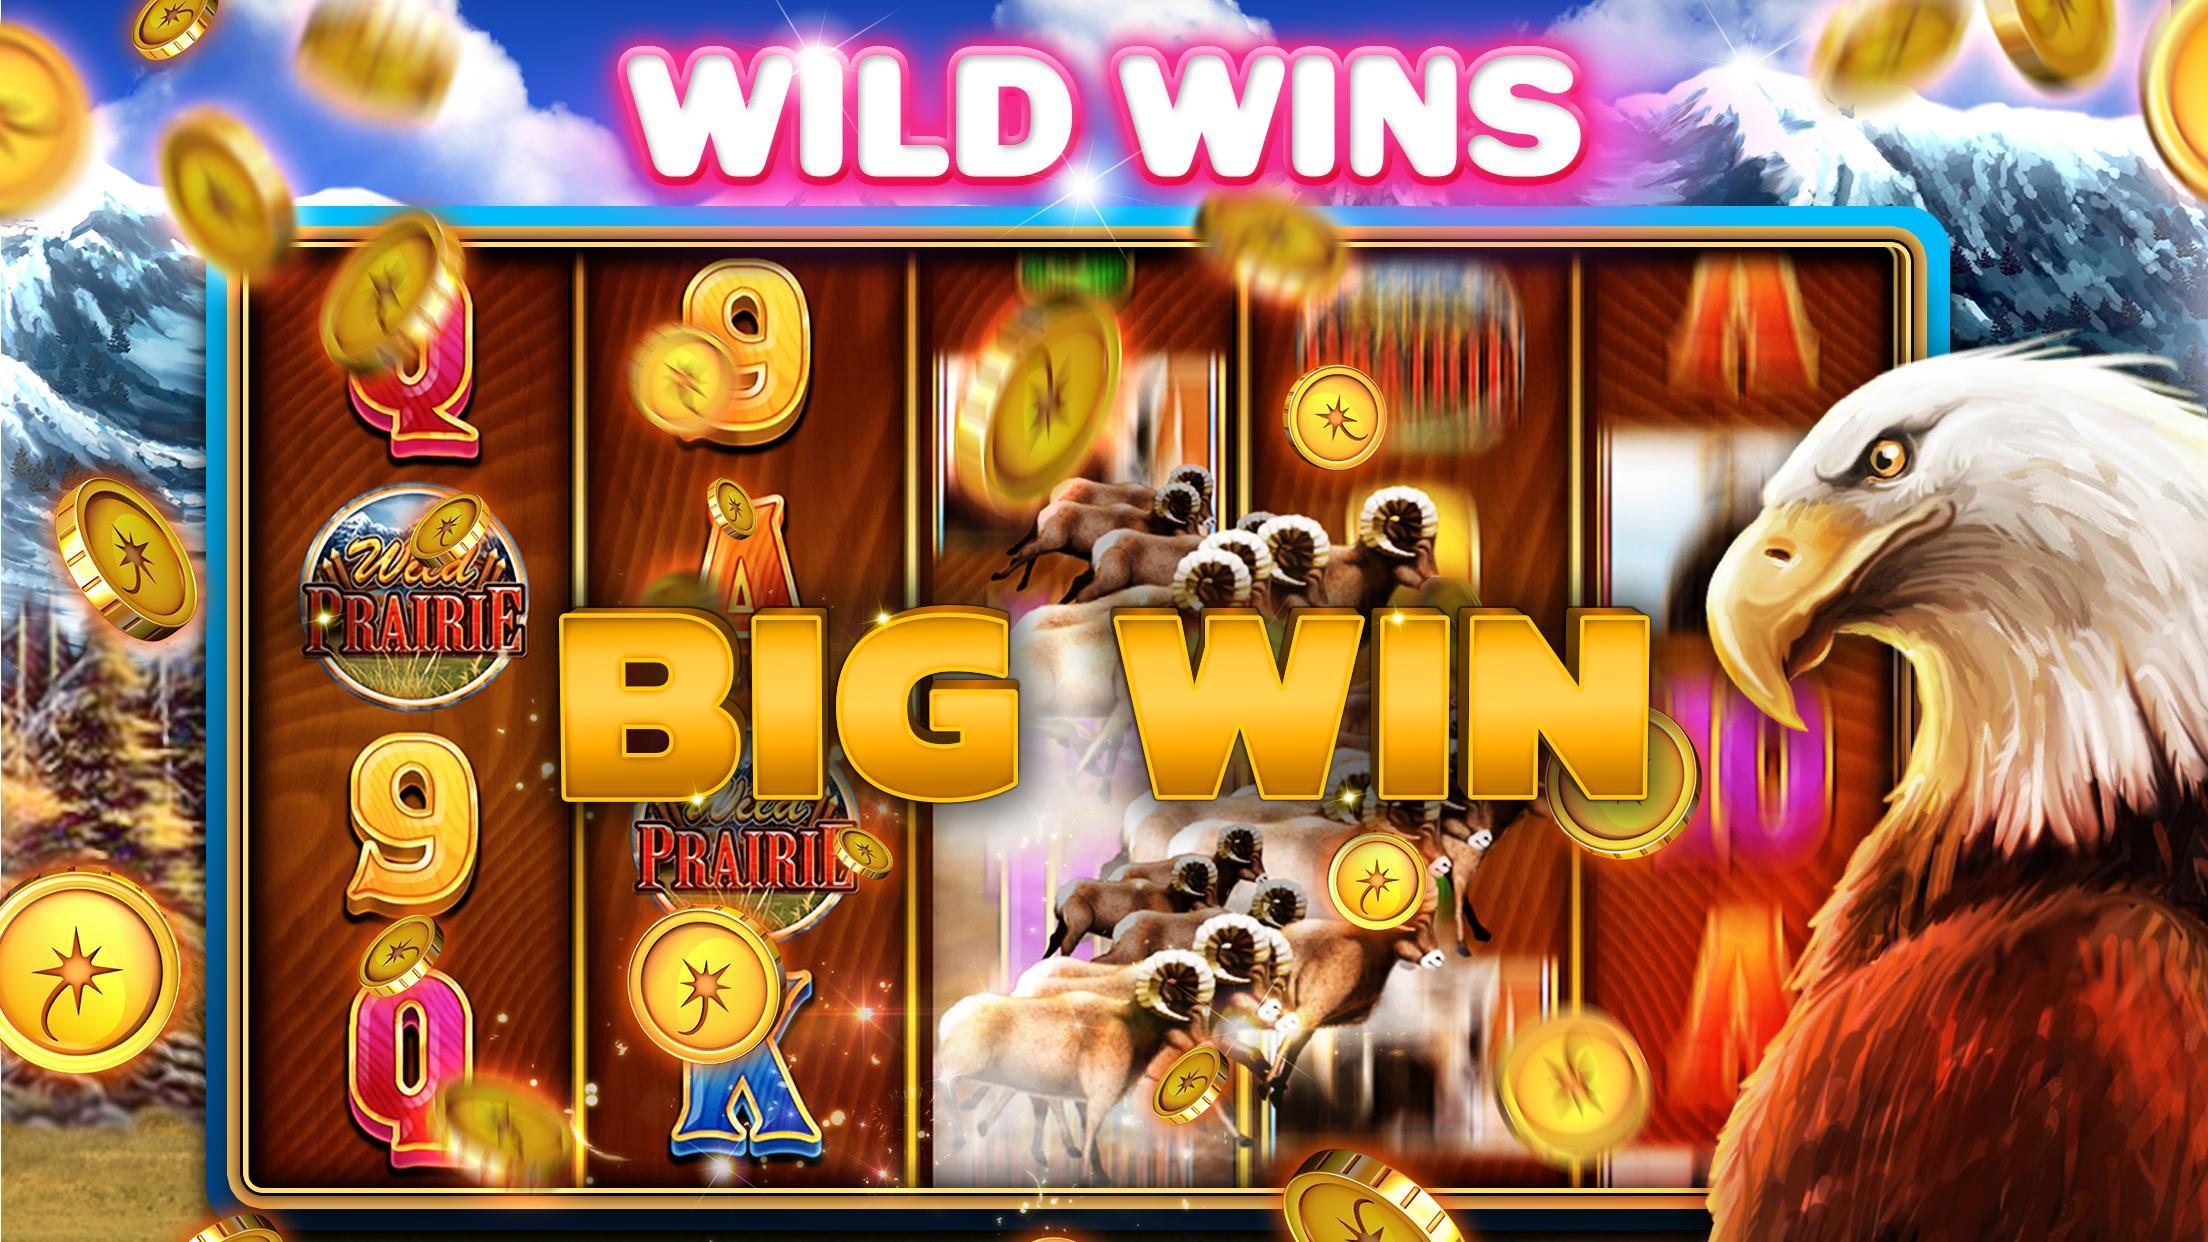 Jackpotjoy Slots Slot machines with Bonus Games 26.0.05 Screenshot 19